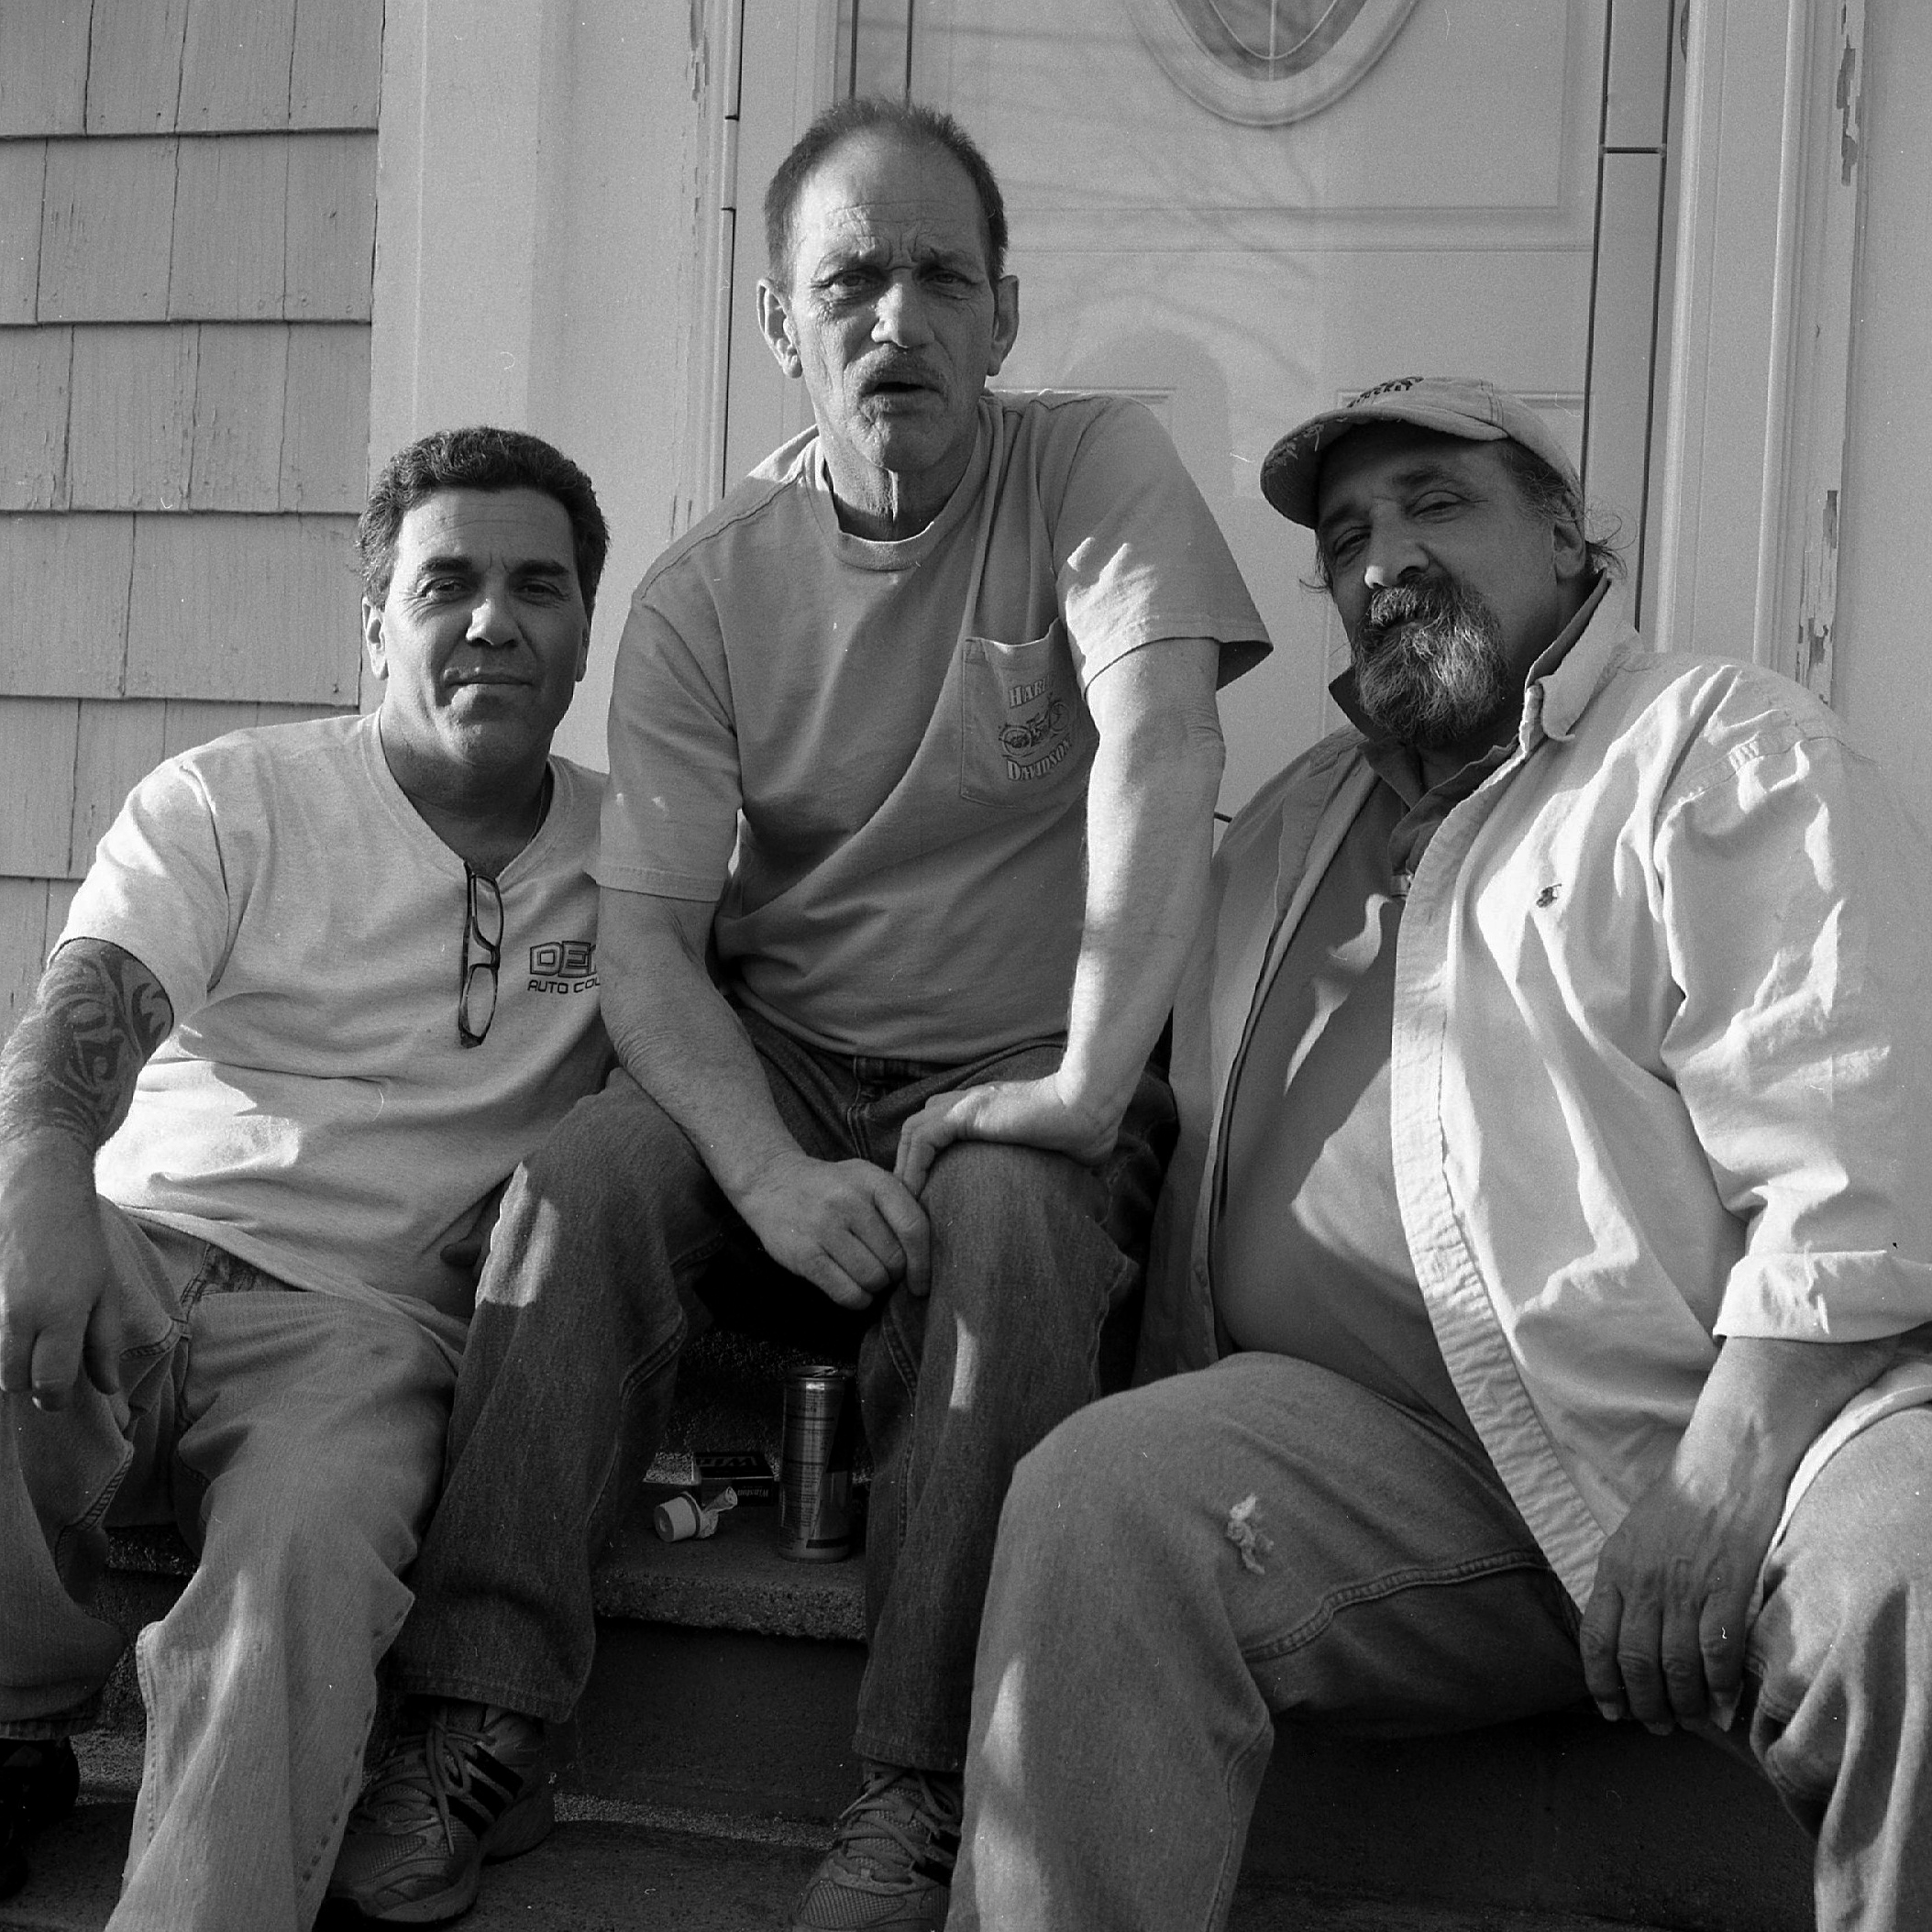 Providence, Rhode Island, 2011